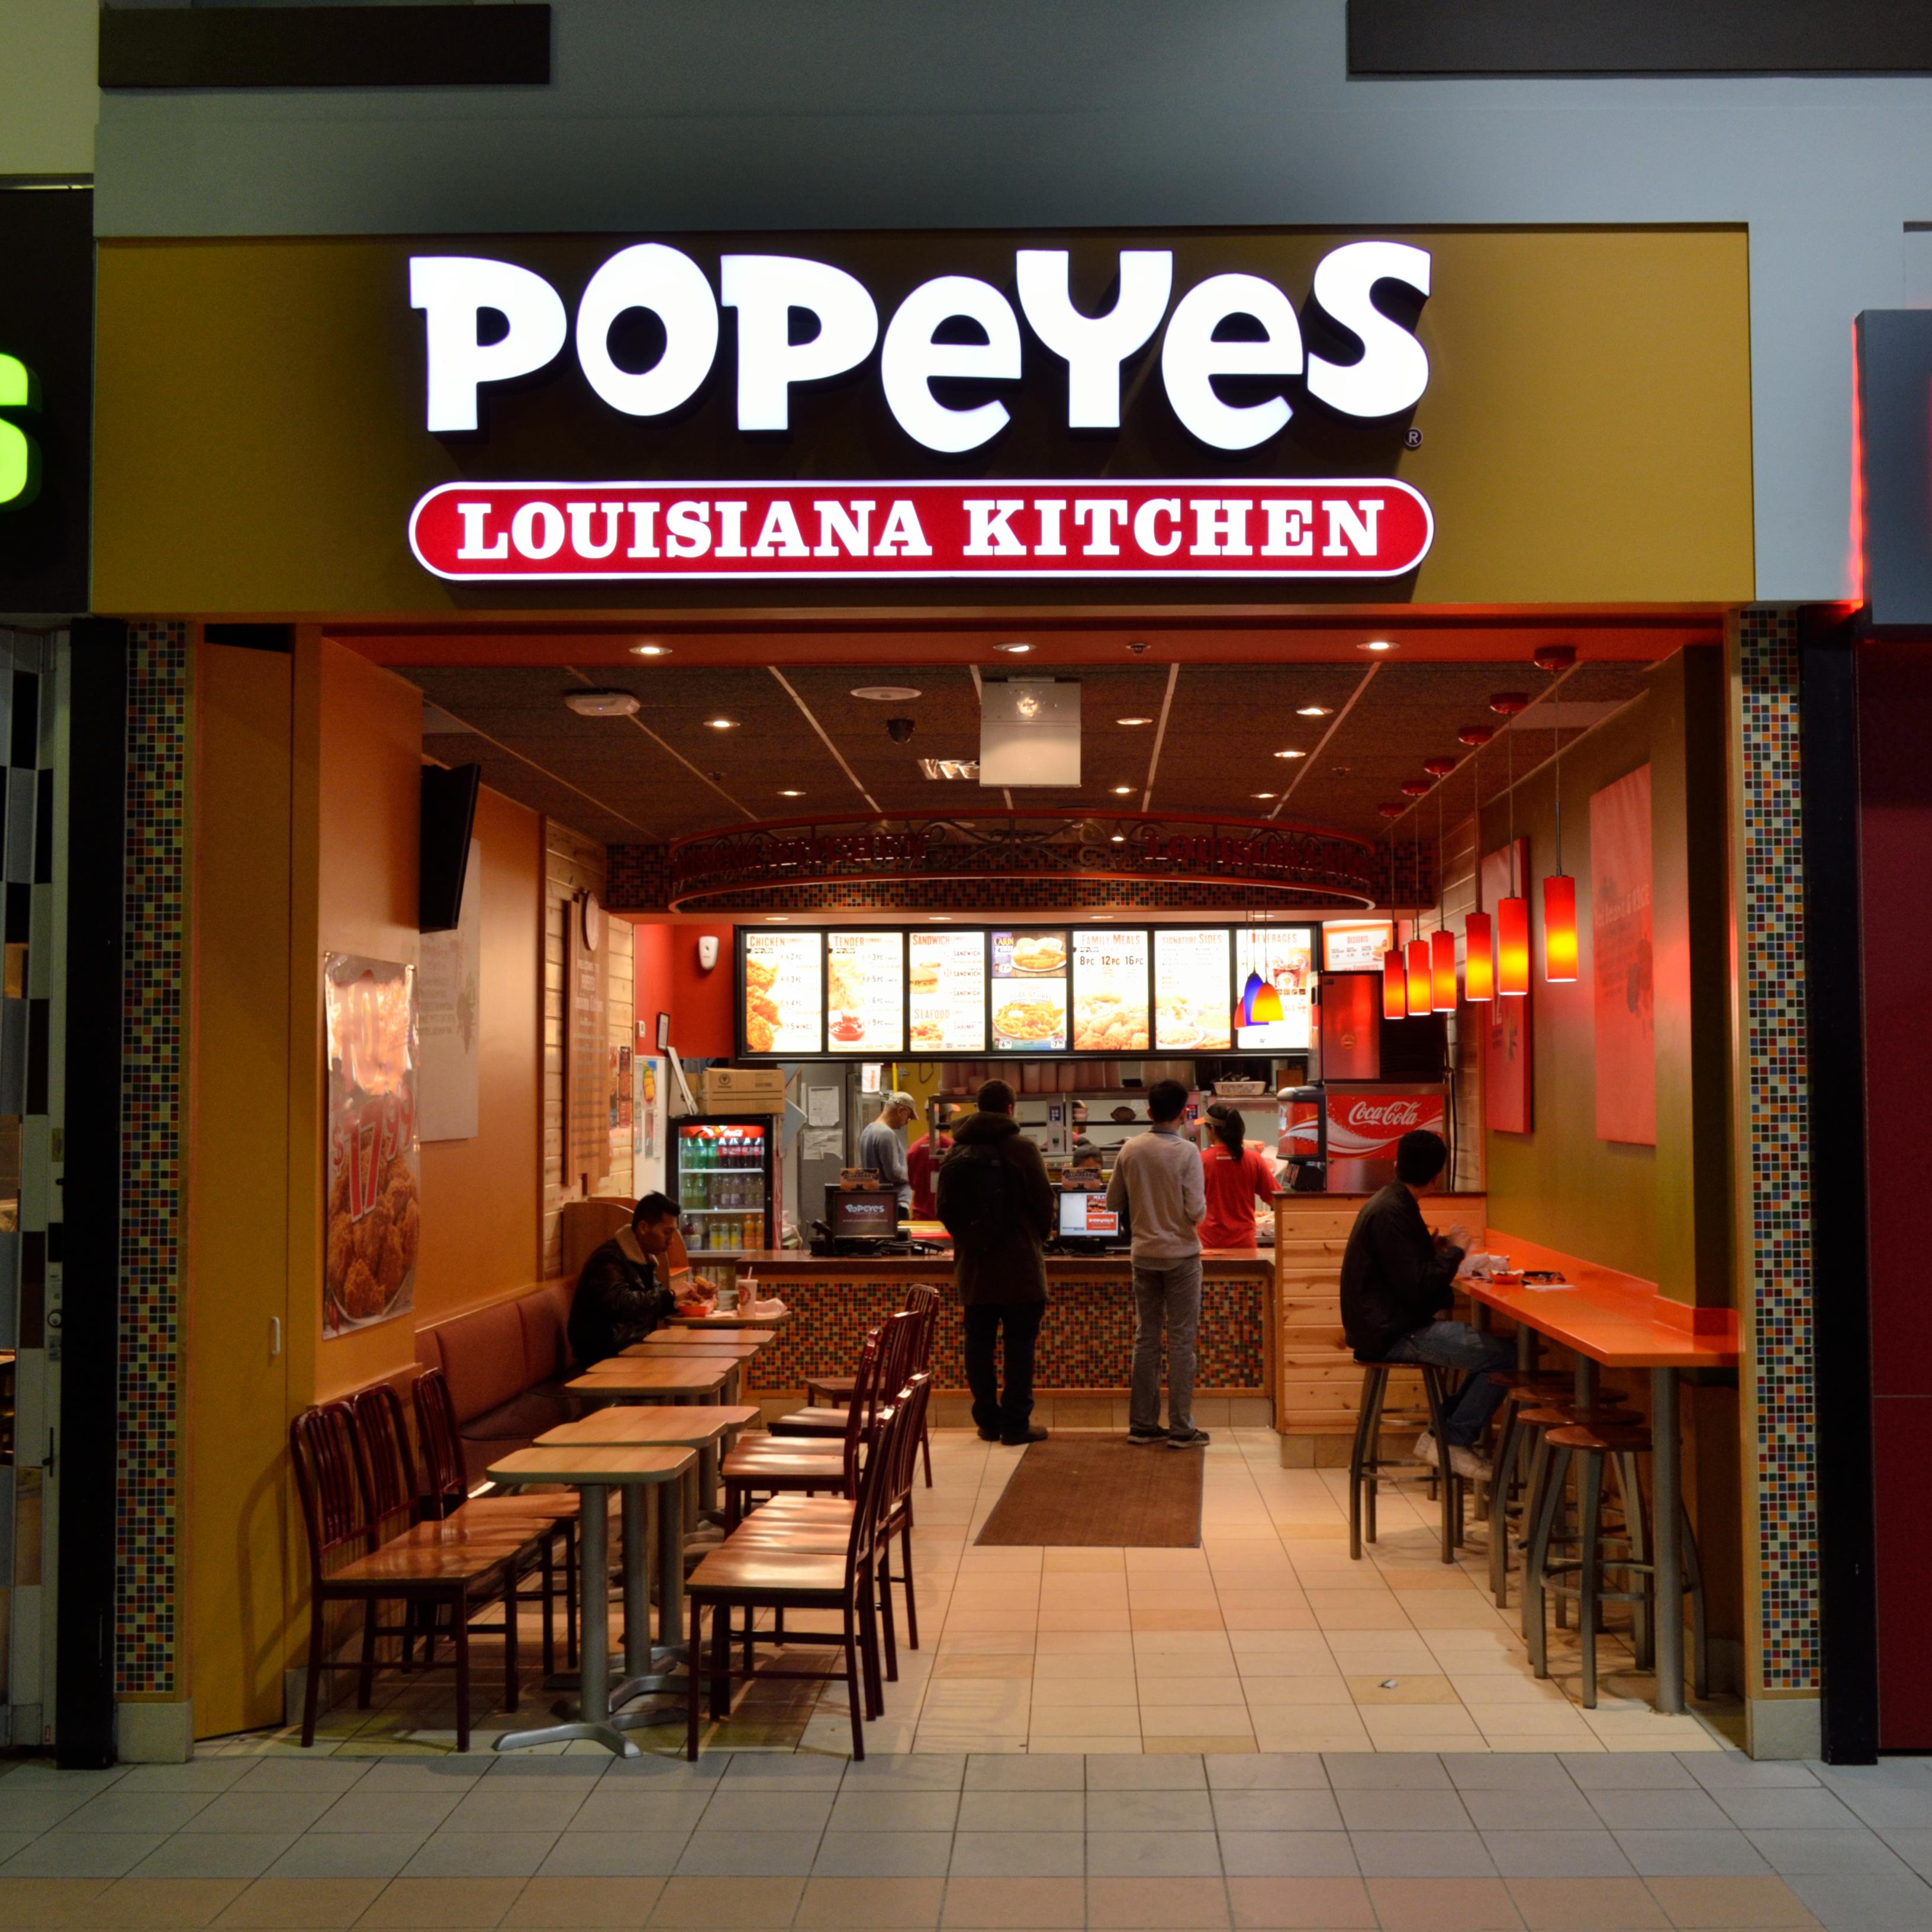 Popeyes Louisiana Kitchen Commercial